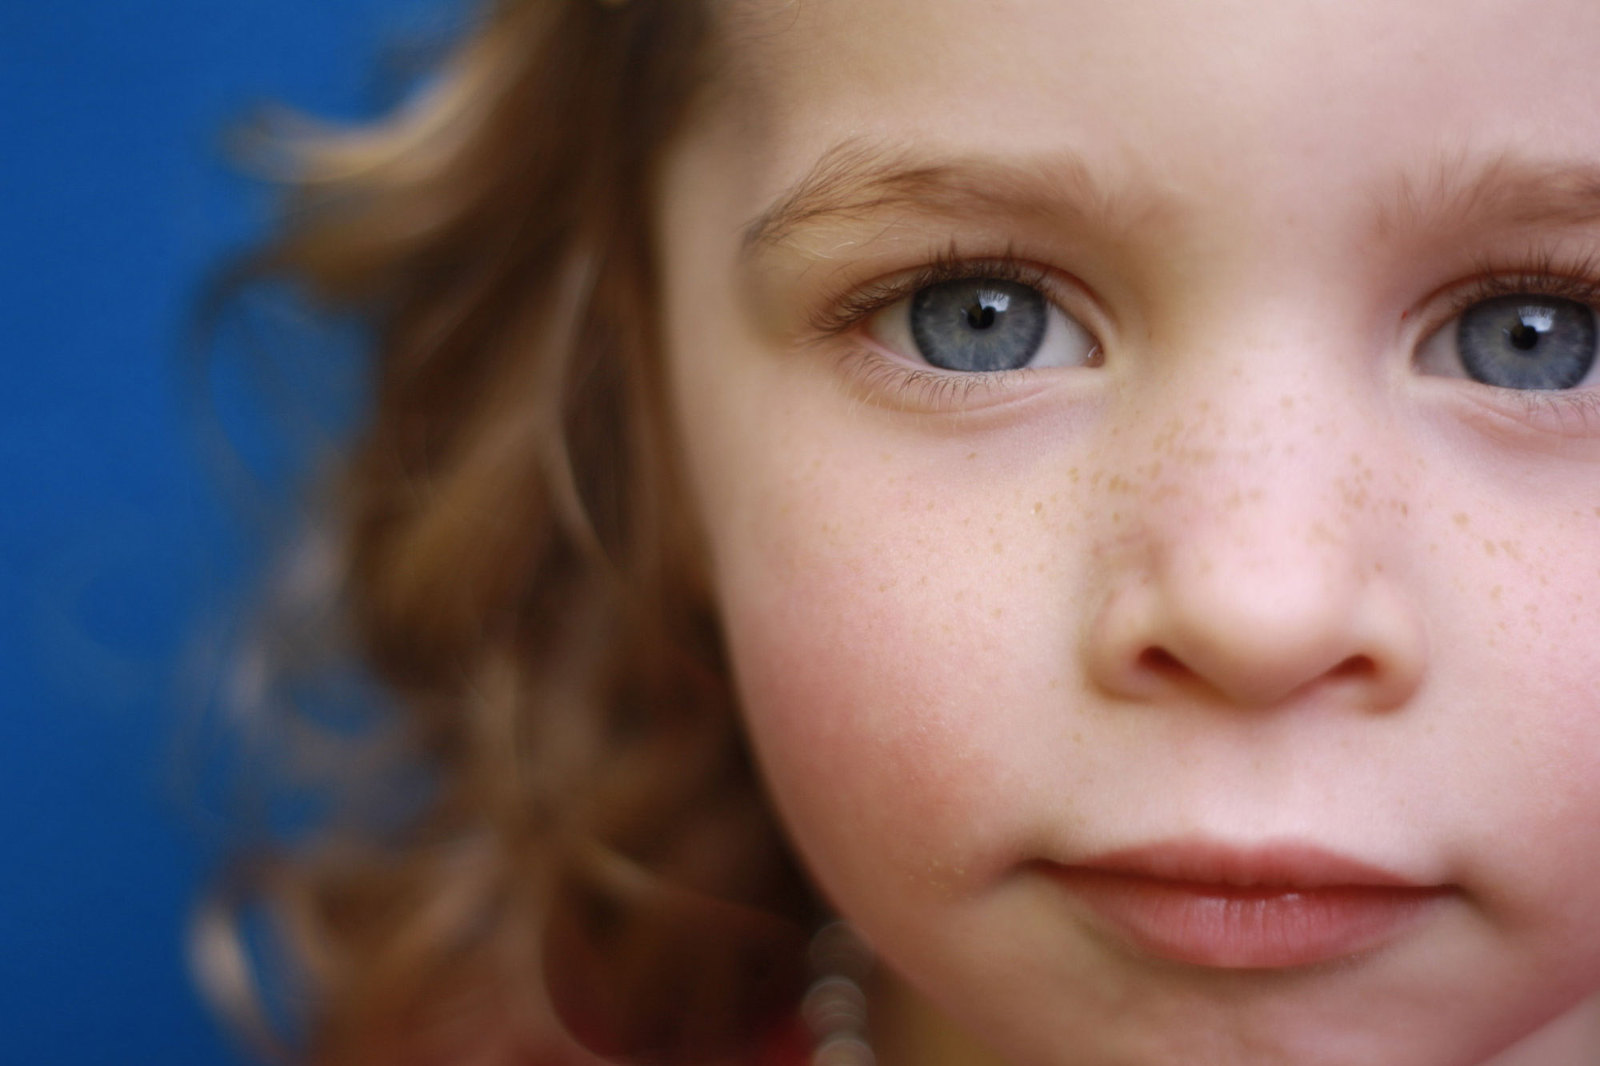 Closeup child photo